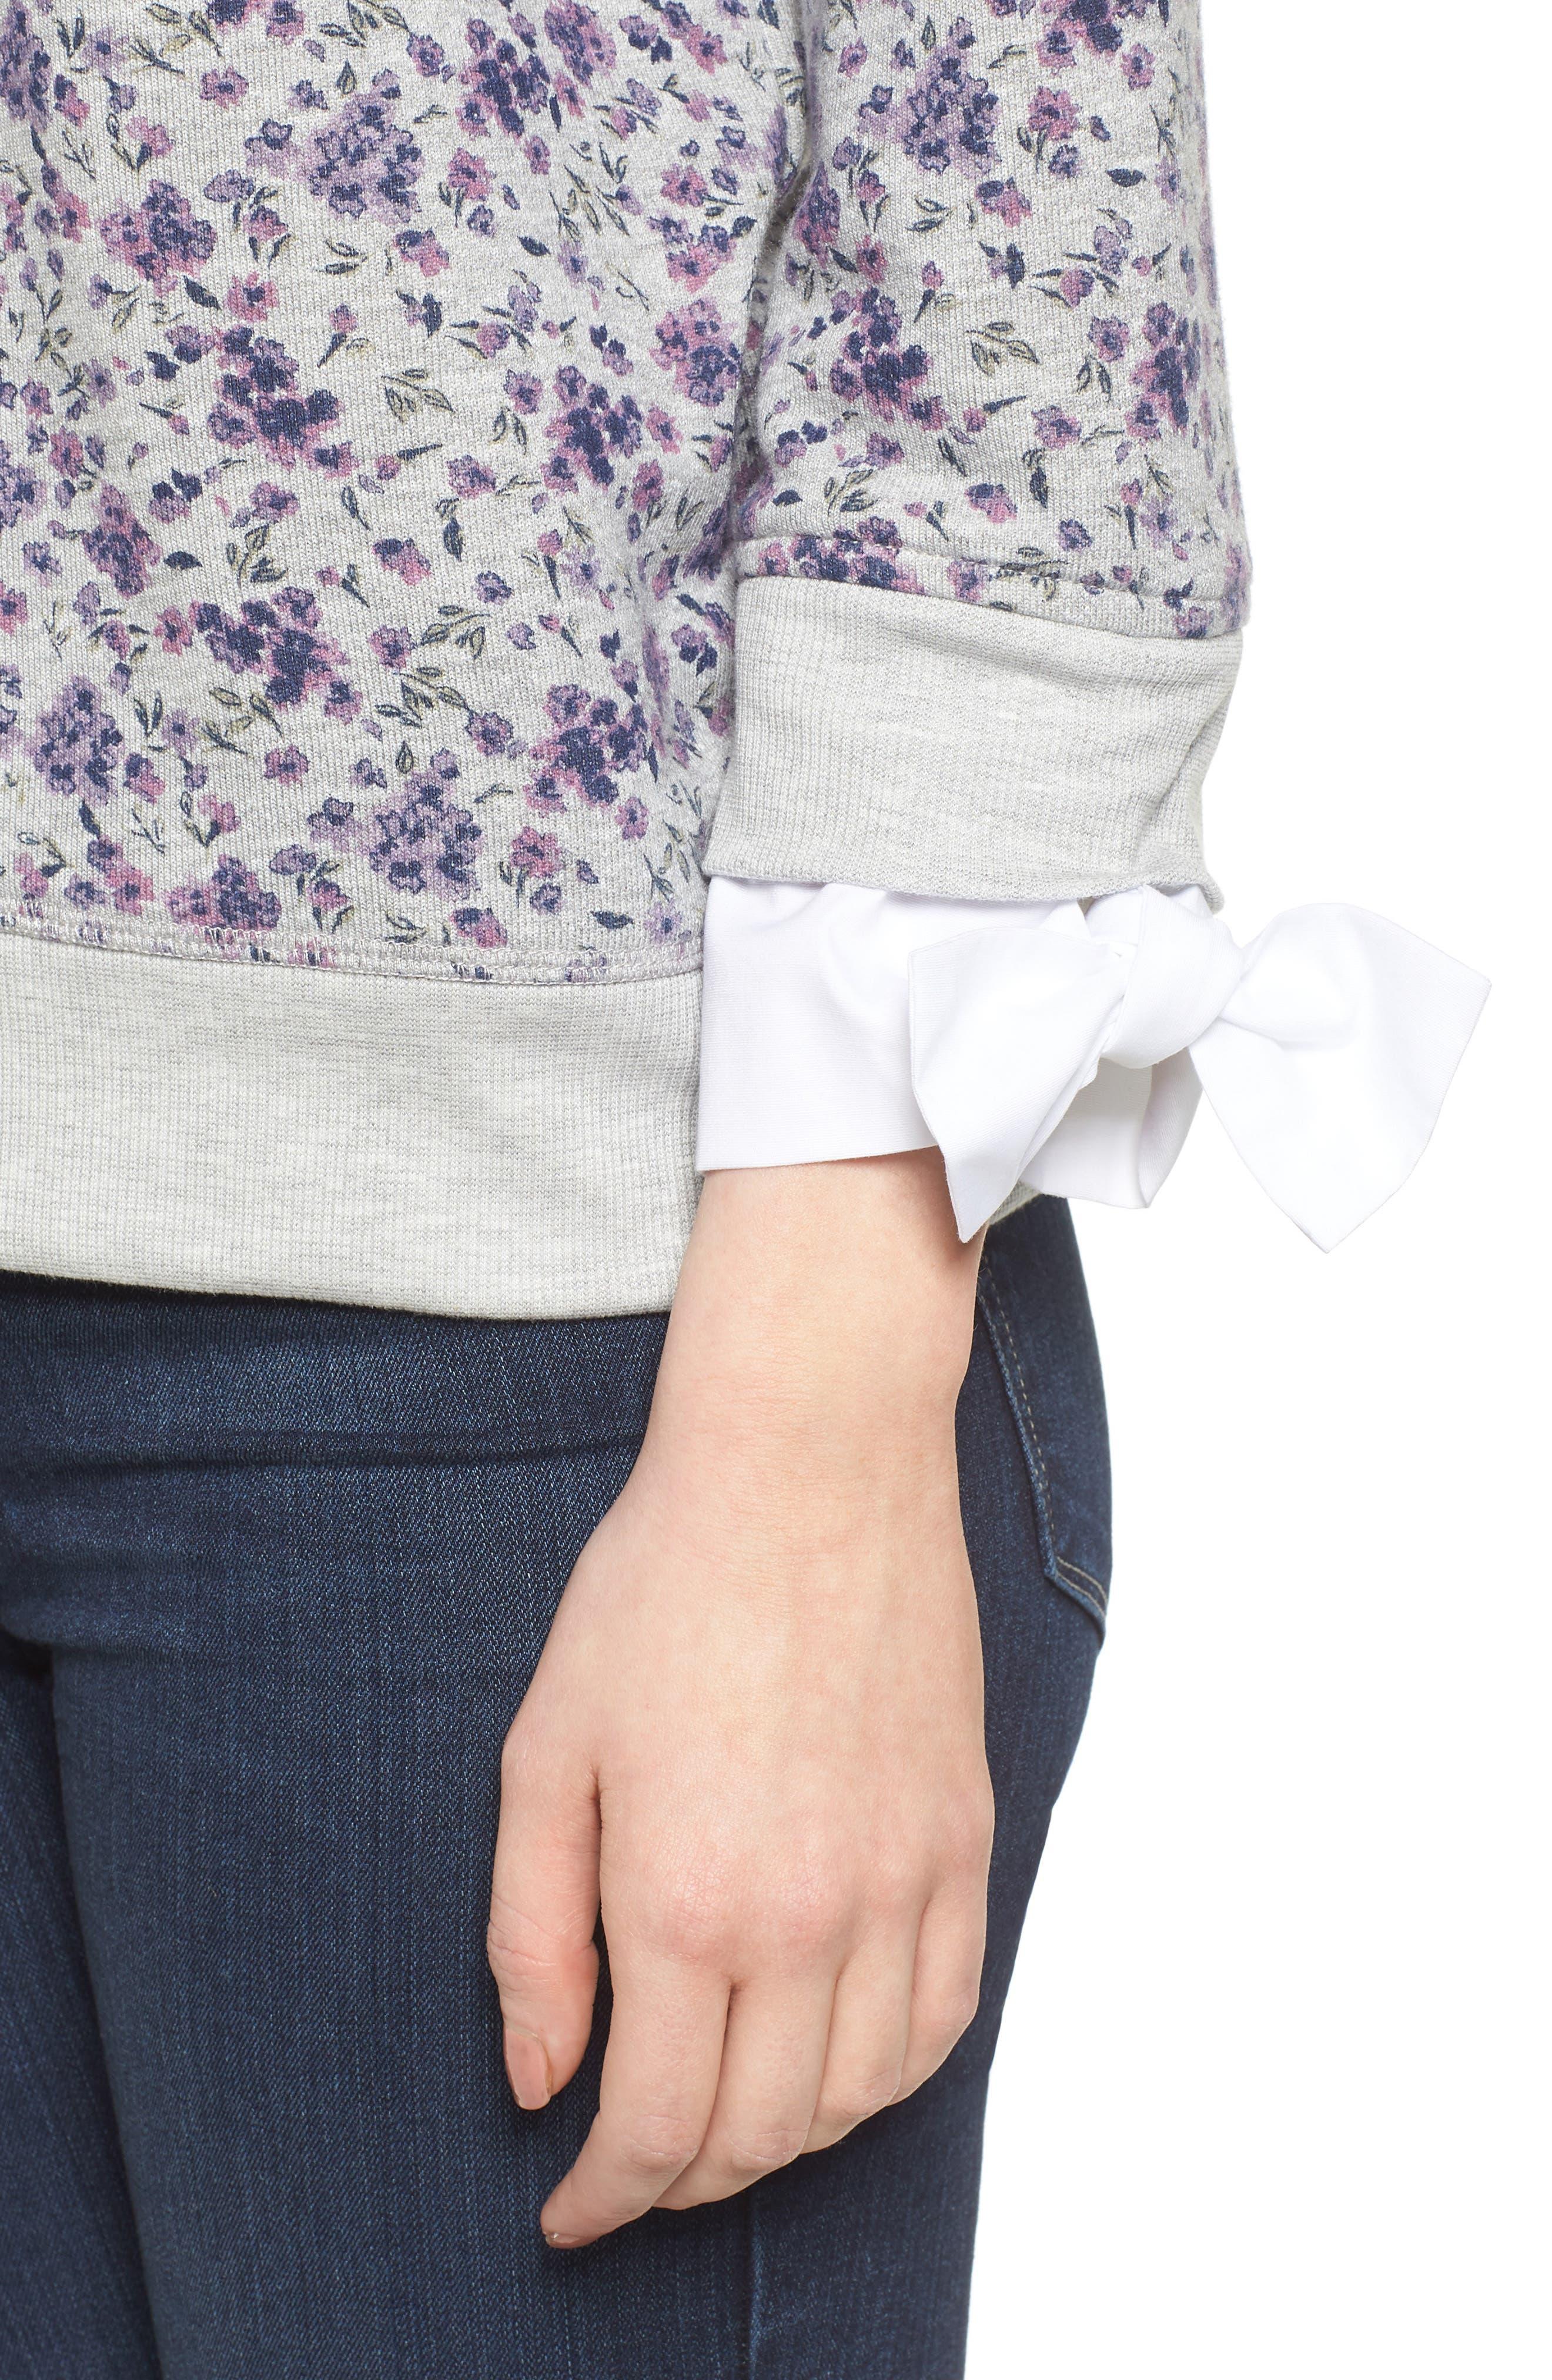 Poplin Cuff Sweatshirt,                             Alternate thumbnail 4, color,                             GREY FLORAL W/ WHITE POPLIN